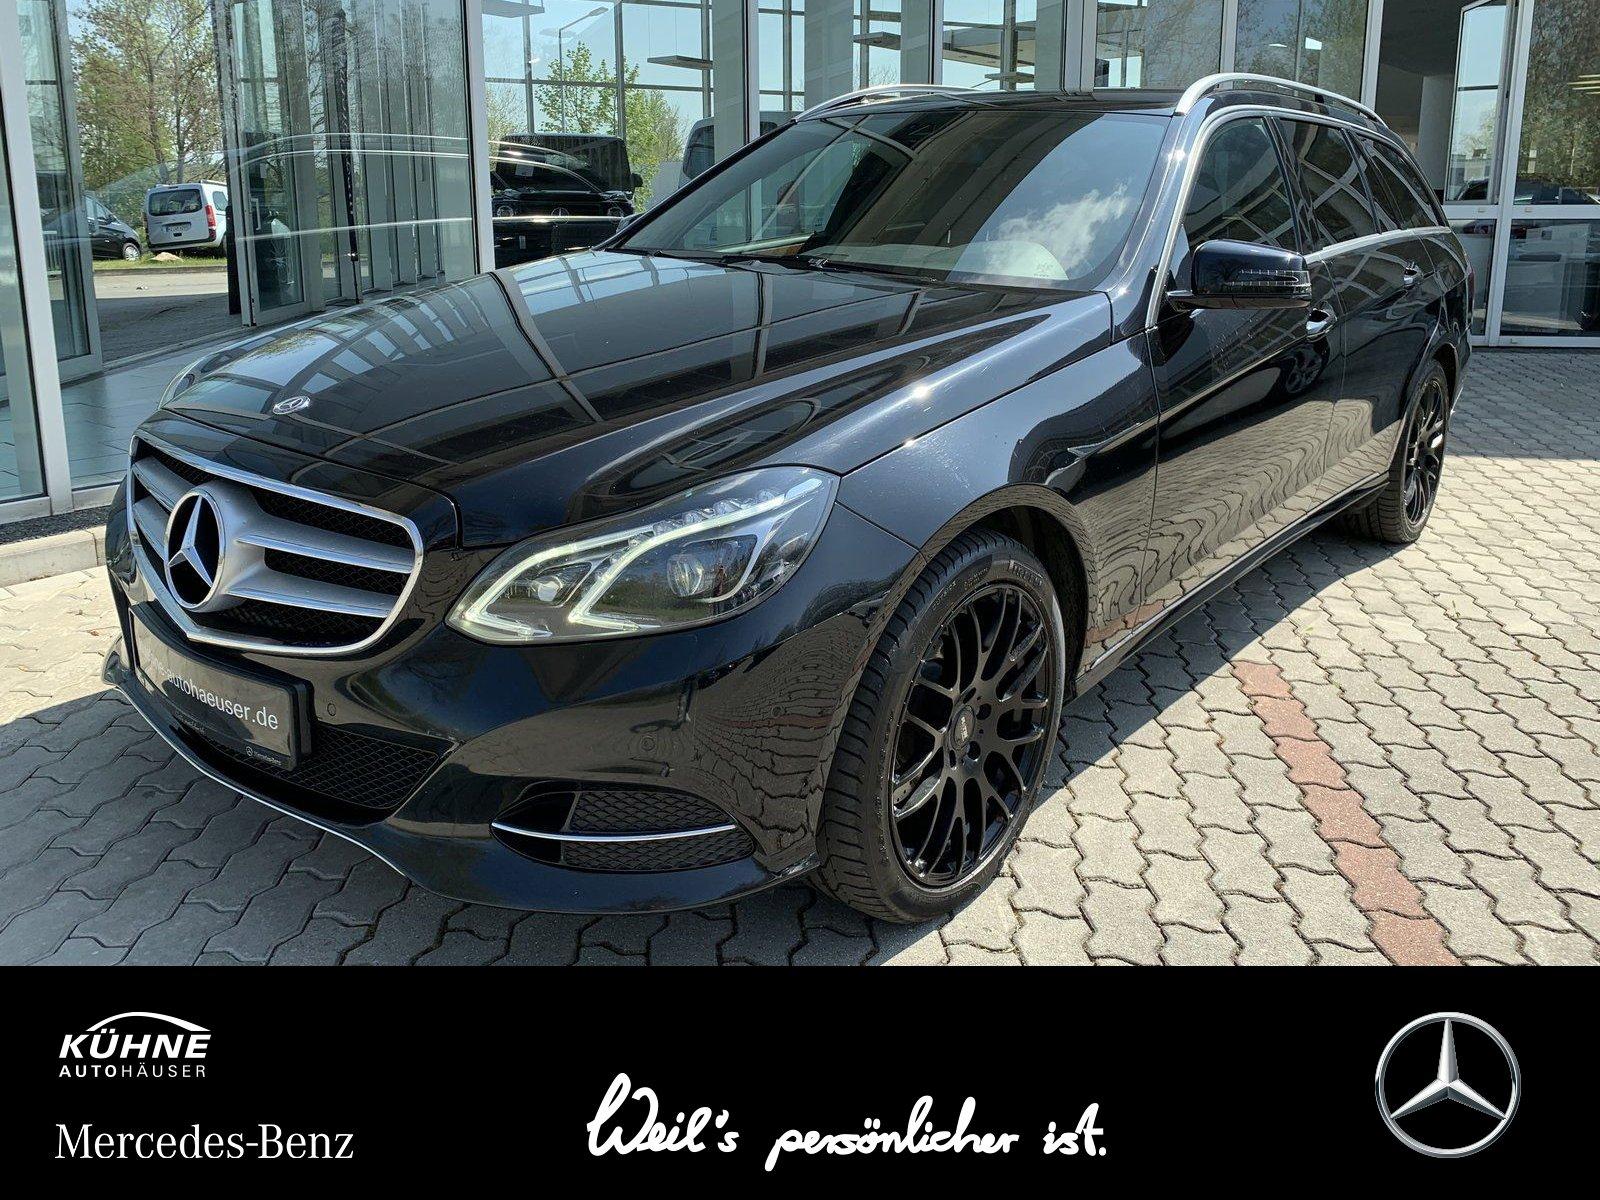 Mercedes-Benz E250T CDI 4M Avantg+Fond-Enter+LED+Standhzg+H&K, Jahr 2013, Diesel